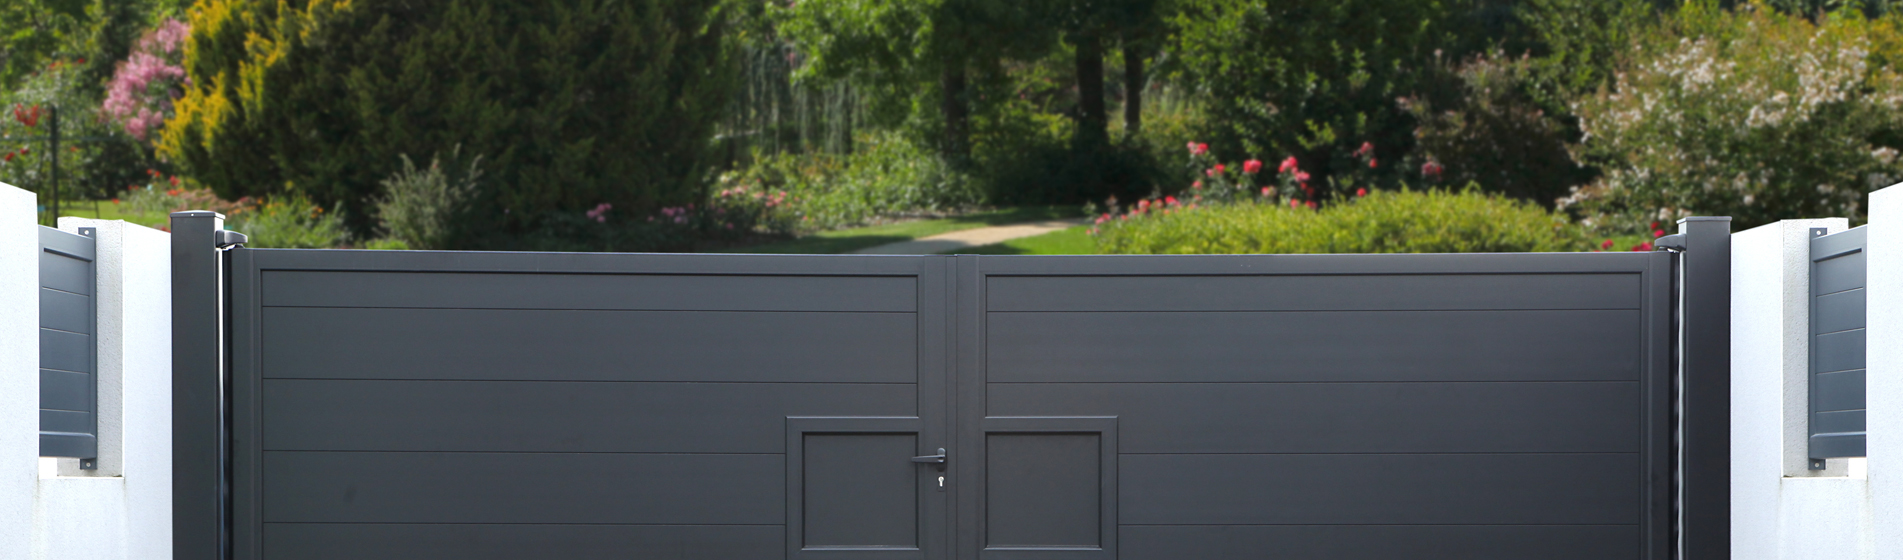 acheter portail battant avec portillon 30 Gard